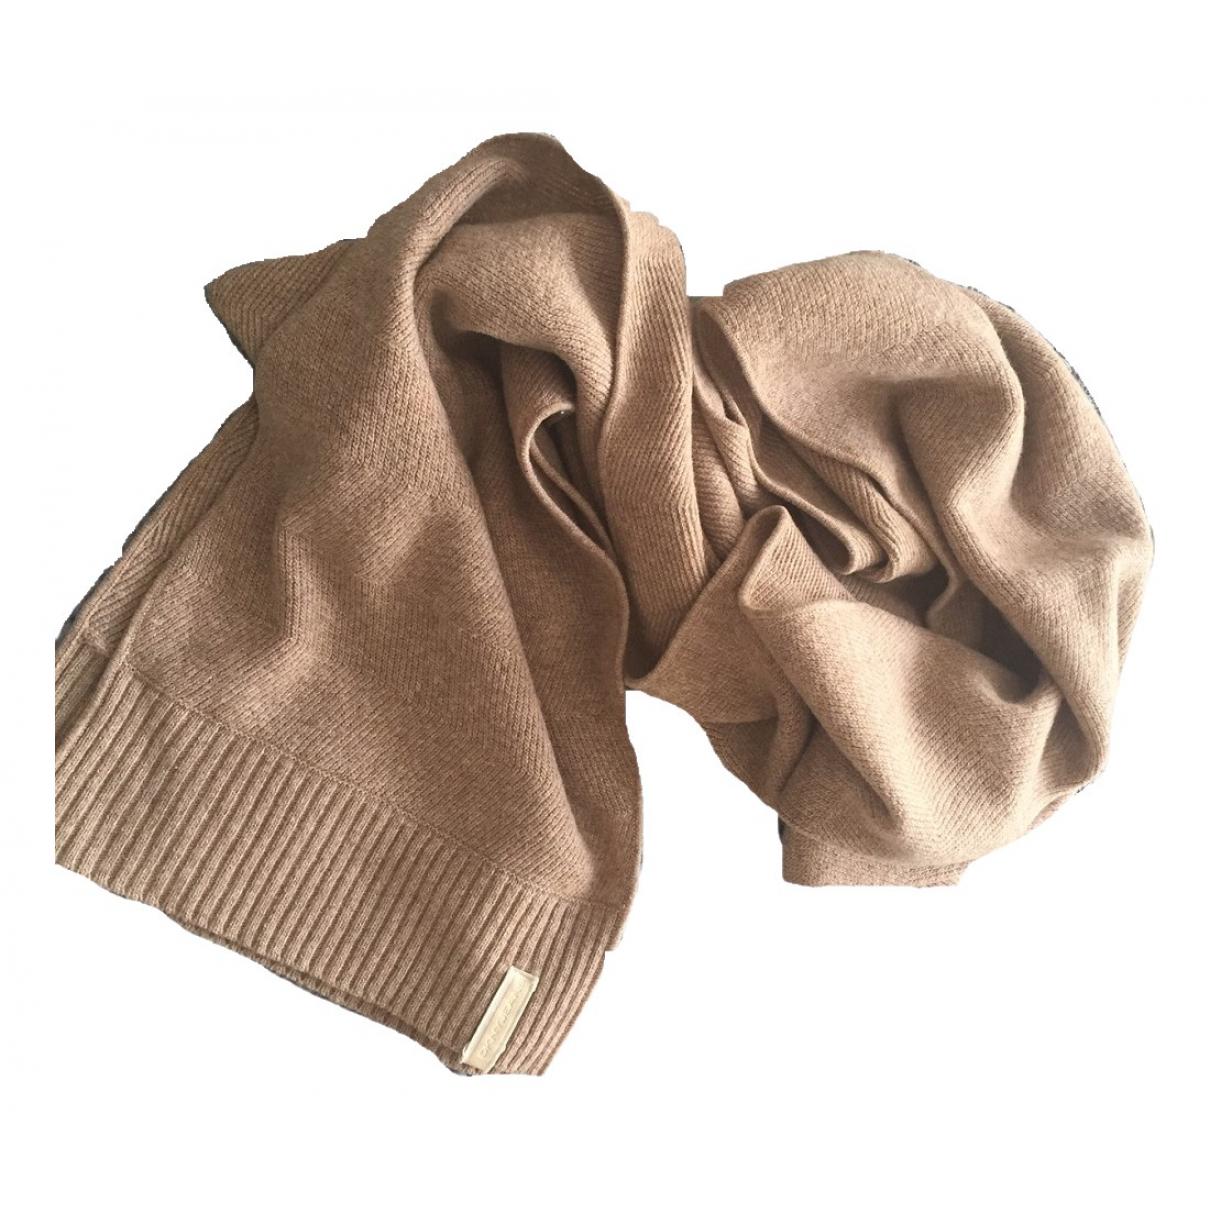 Dkny - Foulard   pour femme en laine - beige